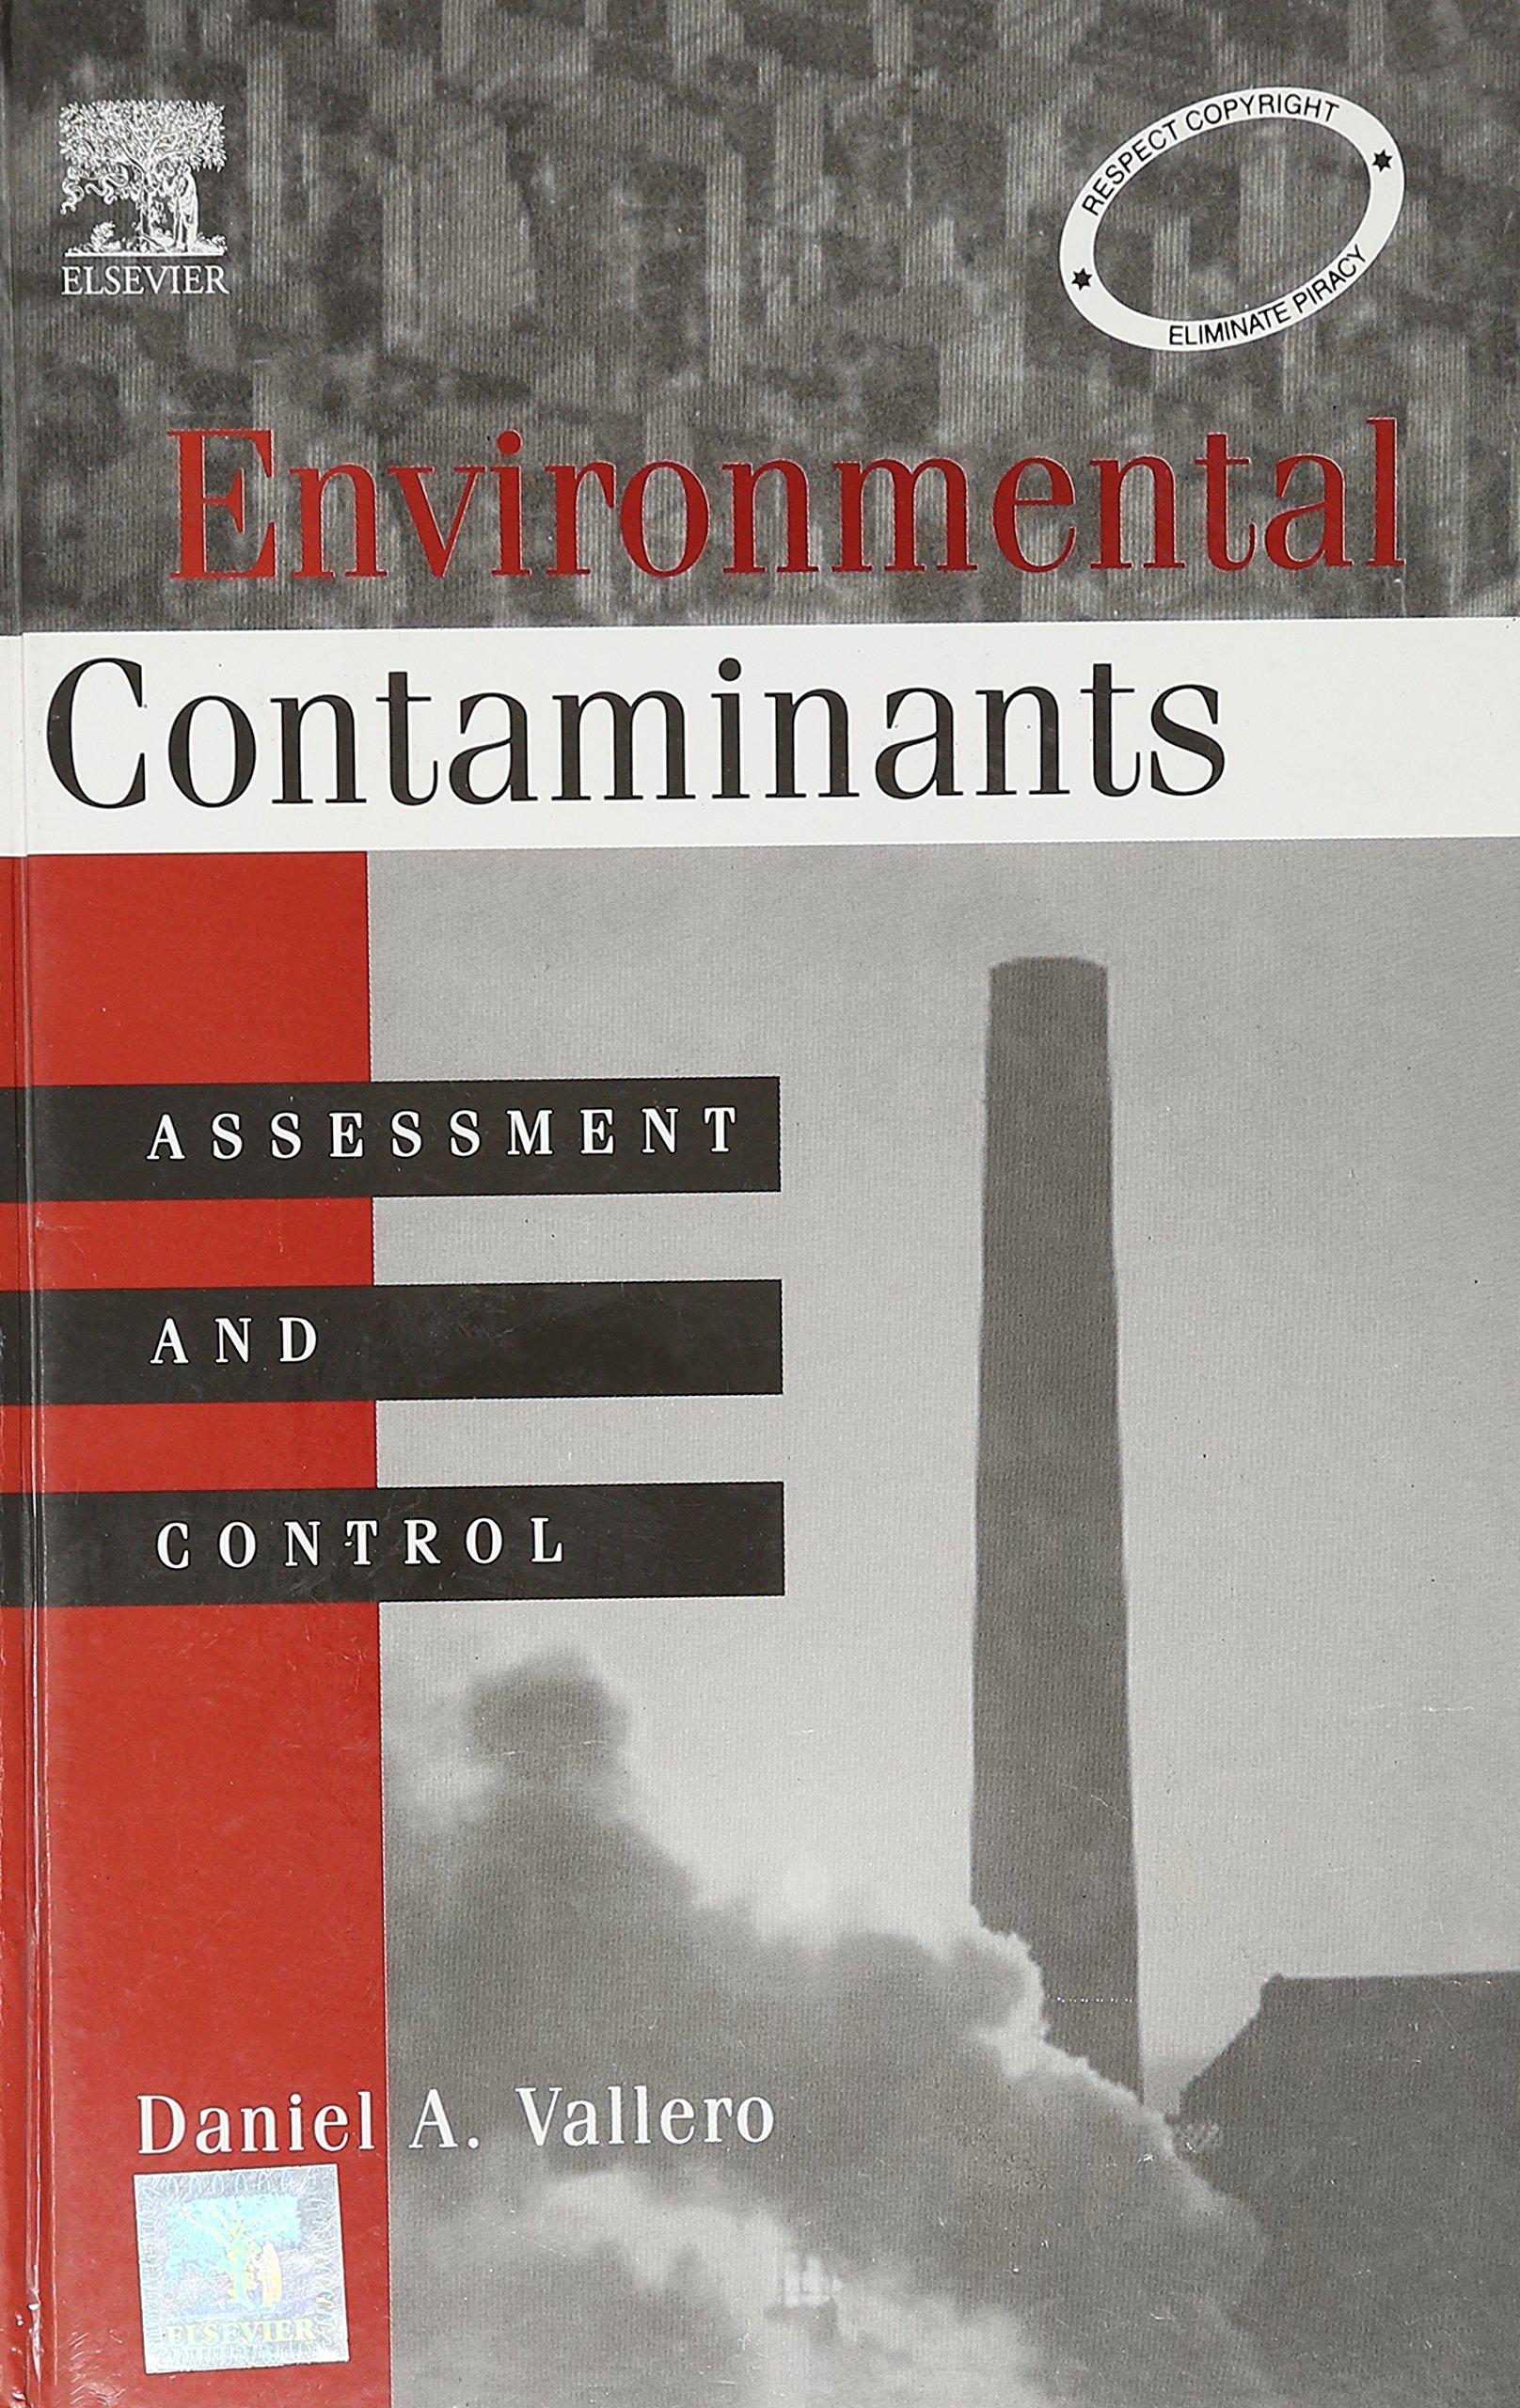 Environmental Contaminants: Assessment and Control